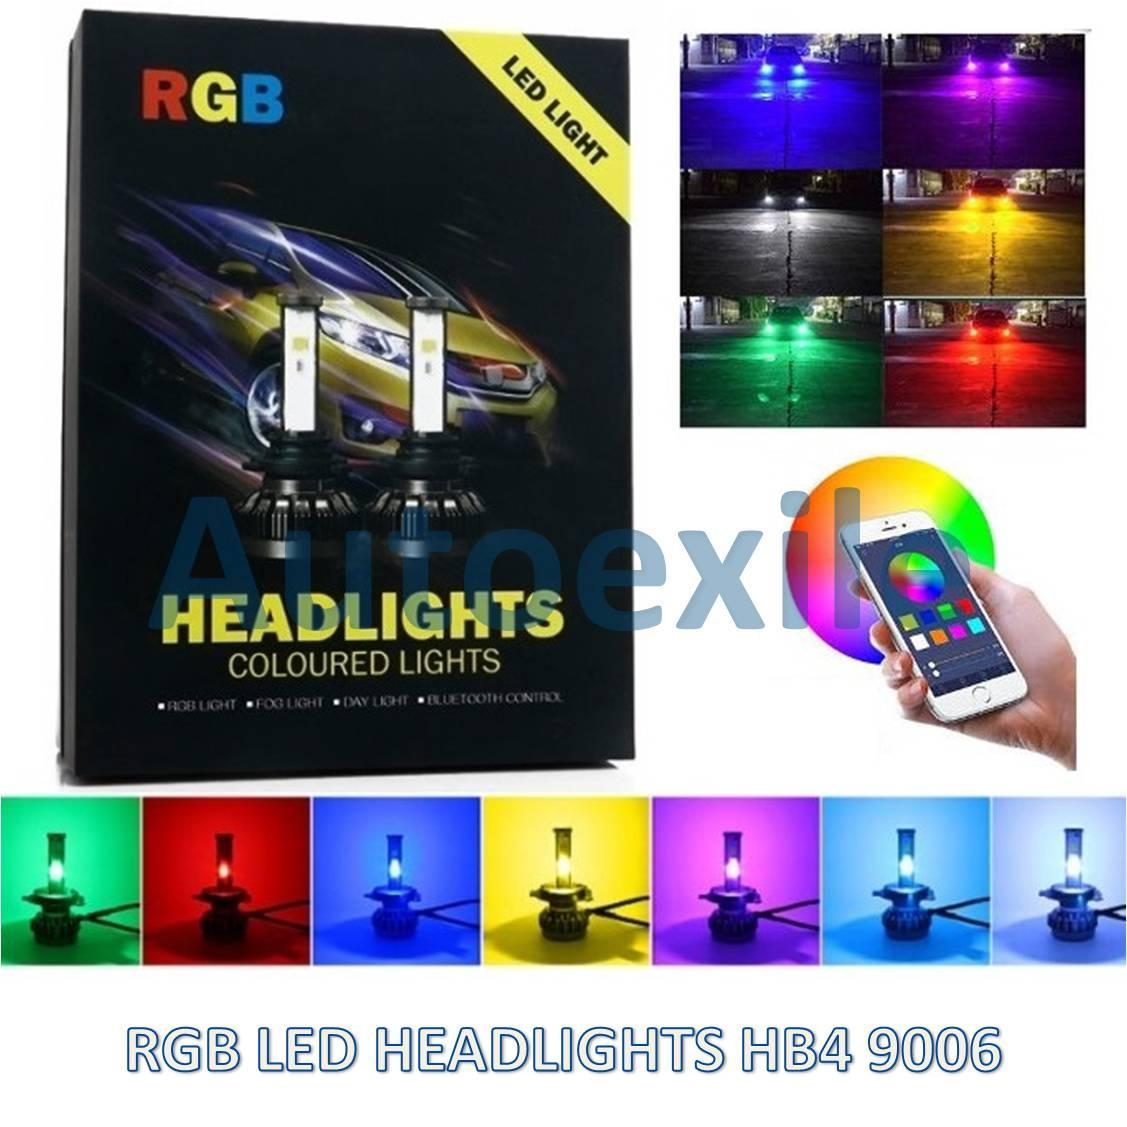 Lampu Mobil RGB LED Warna Warni HB4 9006 40W 6000K Smartphone Colour Control Putih Merah Hijau Biru Terang Avanza Fortuner CRV Innova